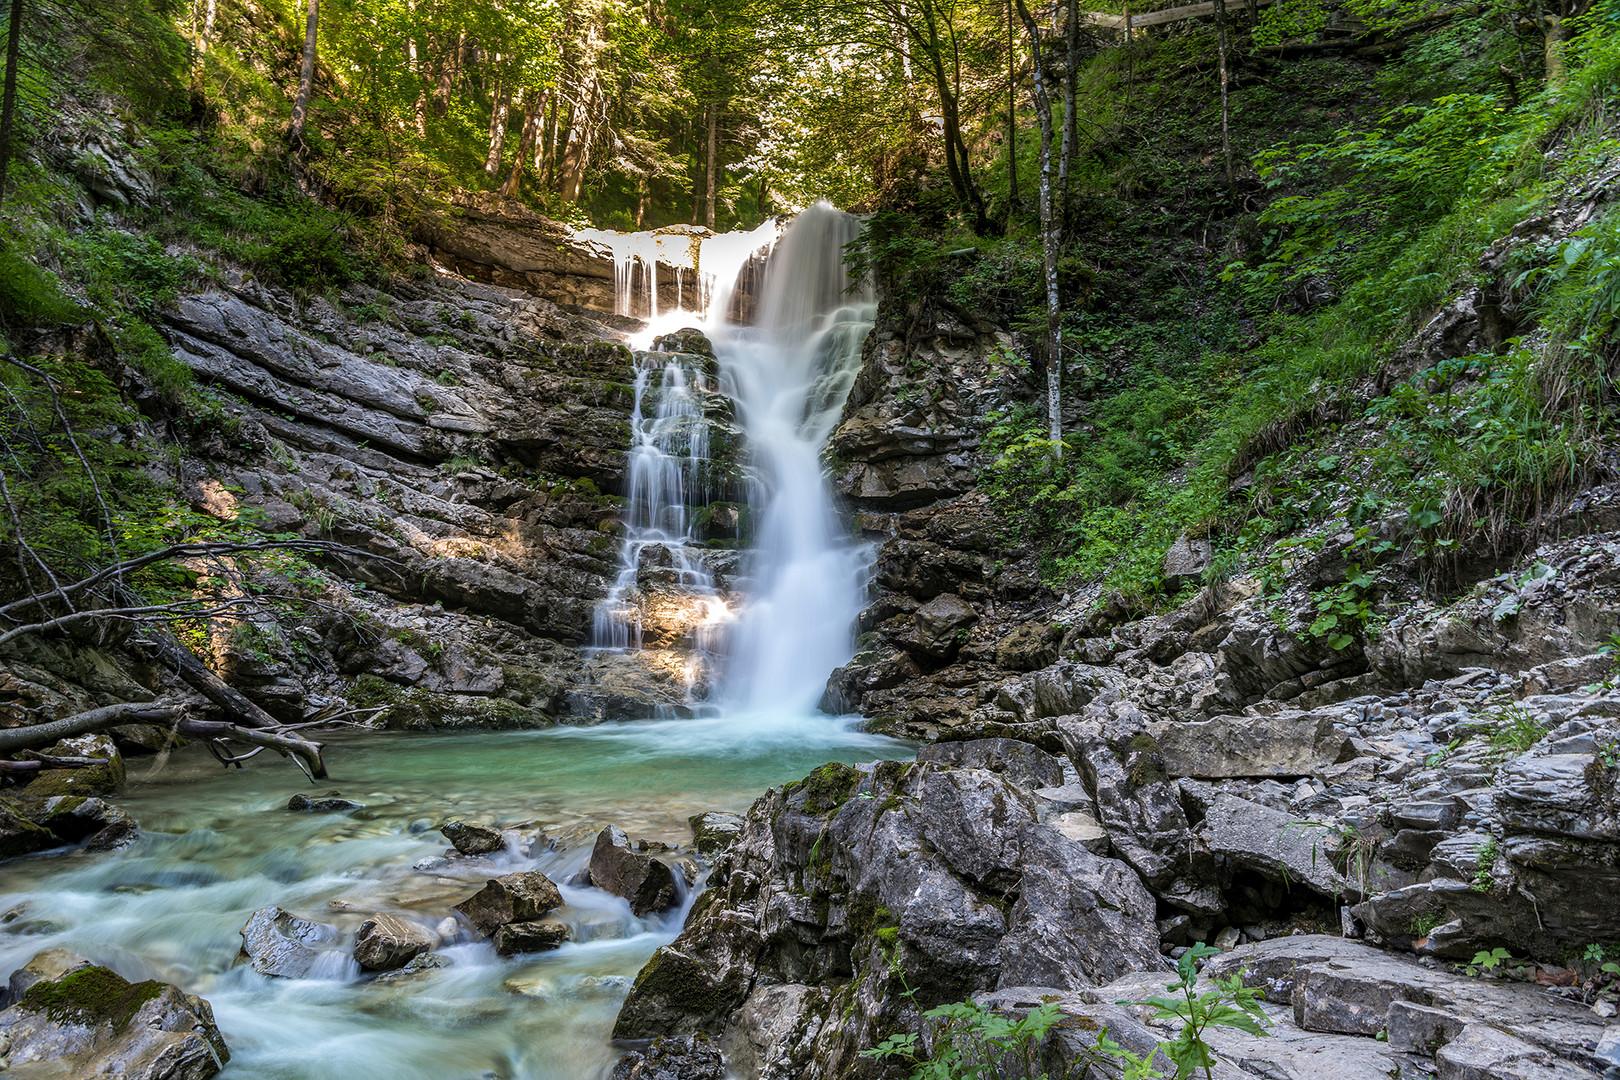 Jenbach Wasserfall - Bad Feilnbach